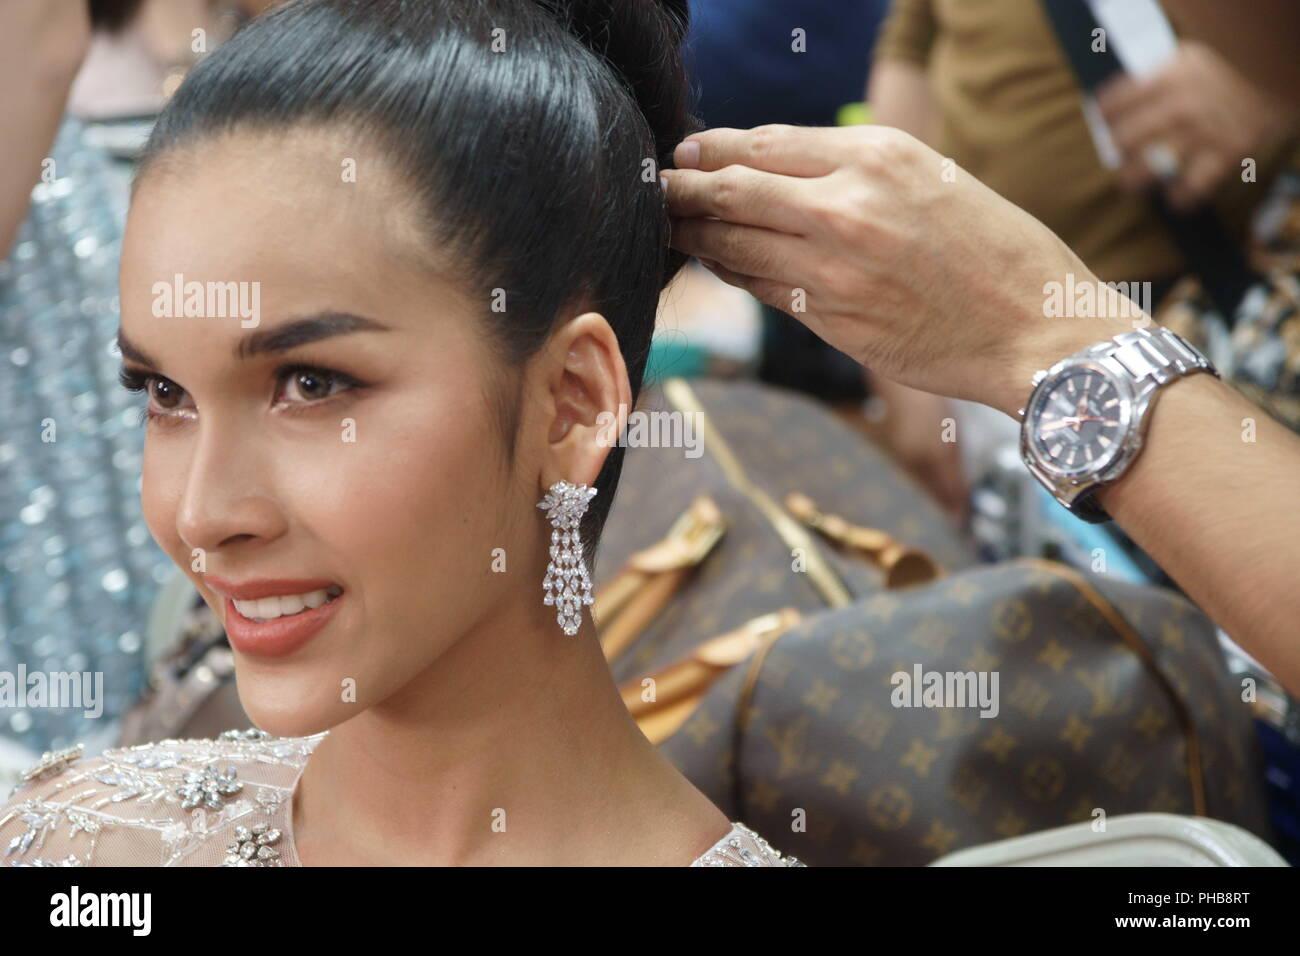 Pattaya Thailand 31th Aug 2018 A Transgender Beauty Contestant